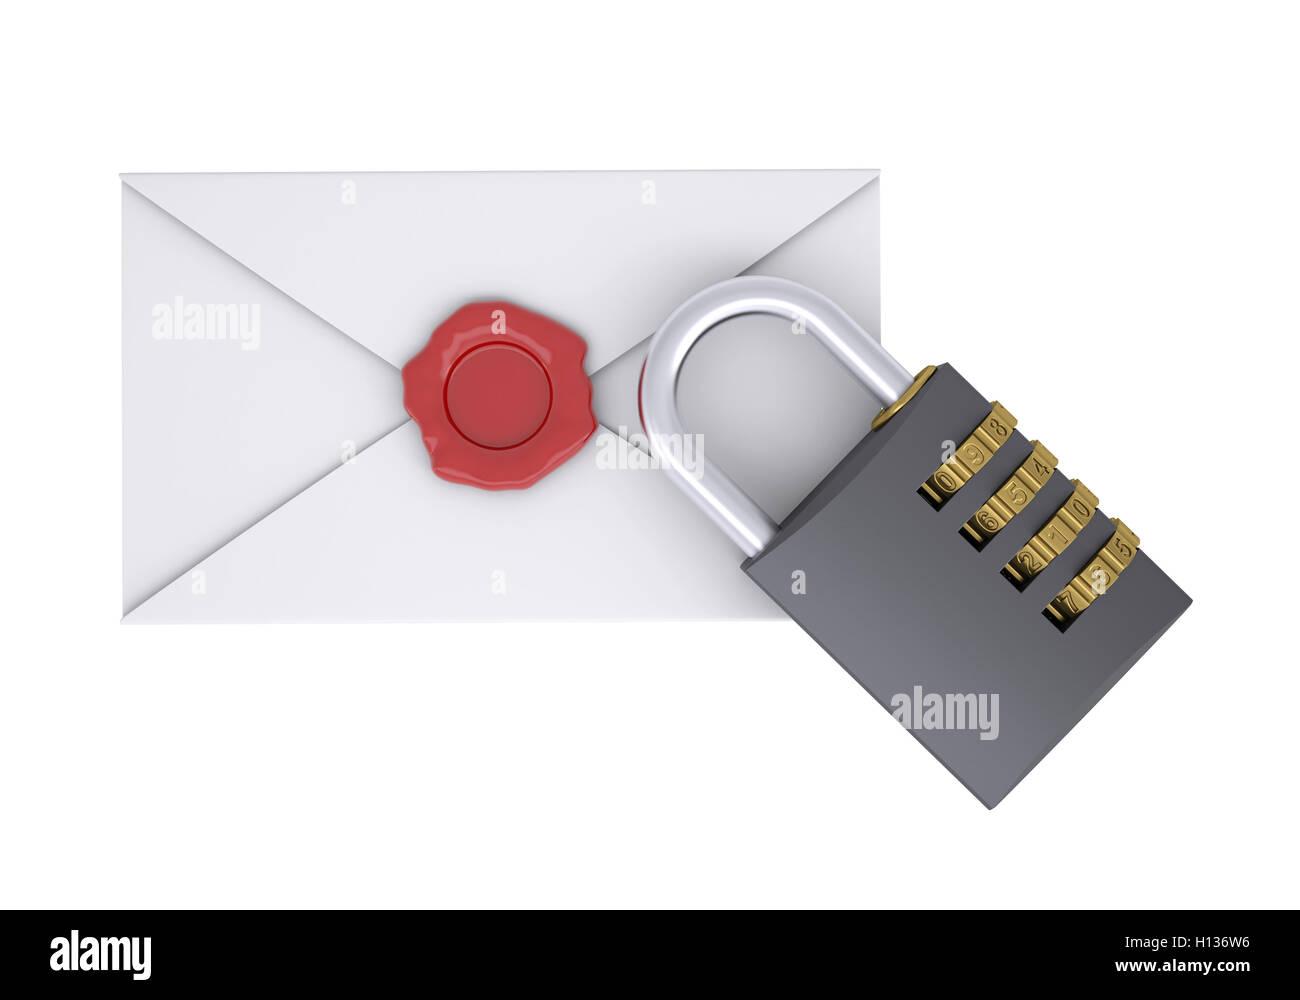 Combination Lock And White Envelope Stock Photo 121158498 Alamy Diagram